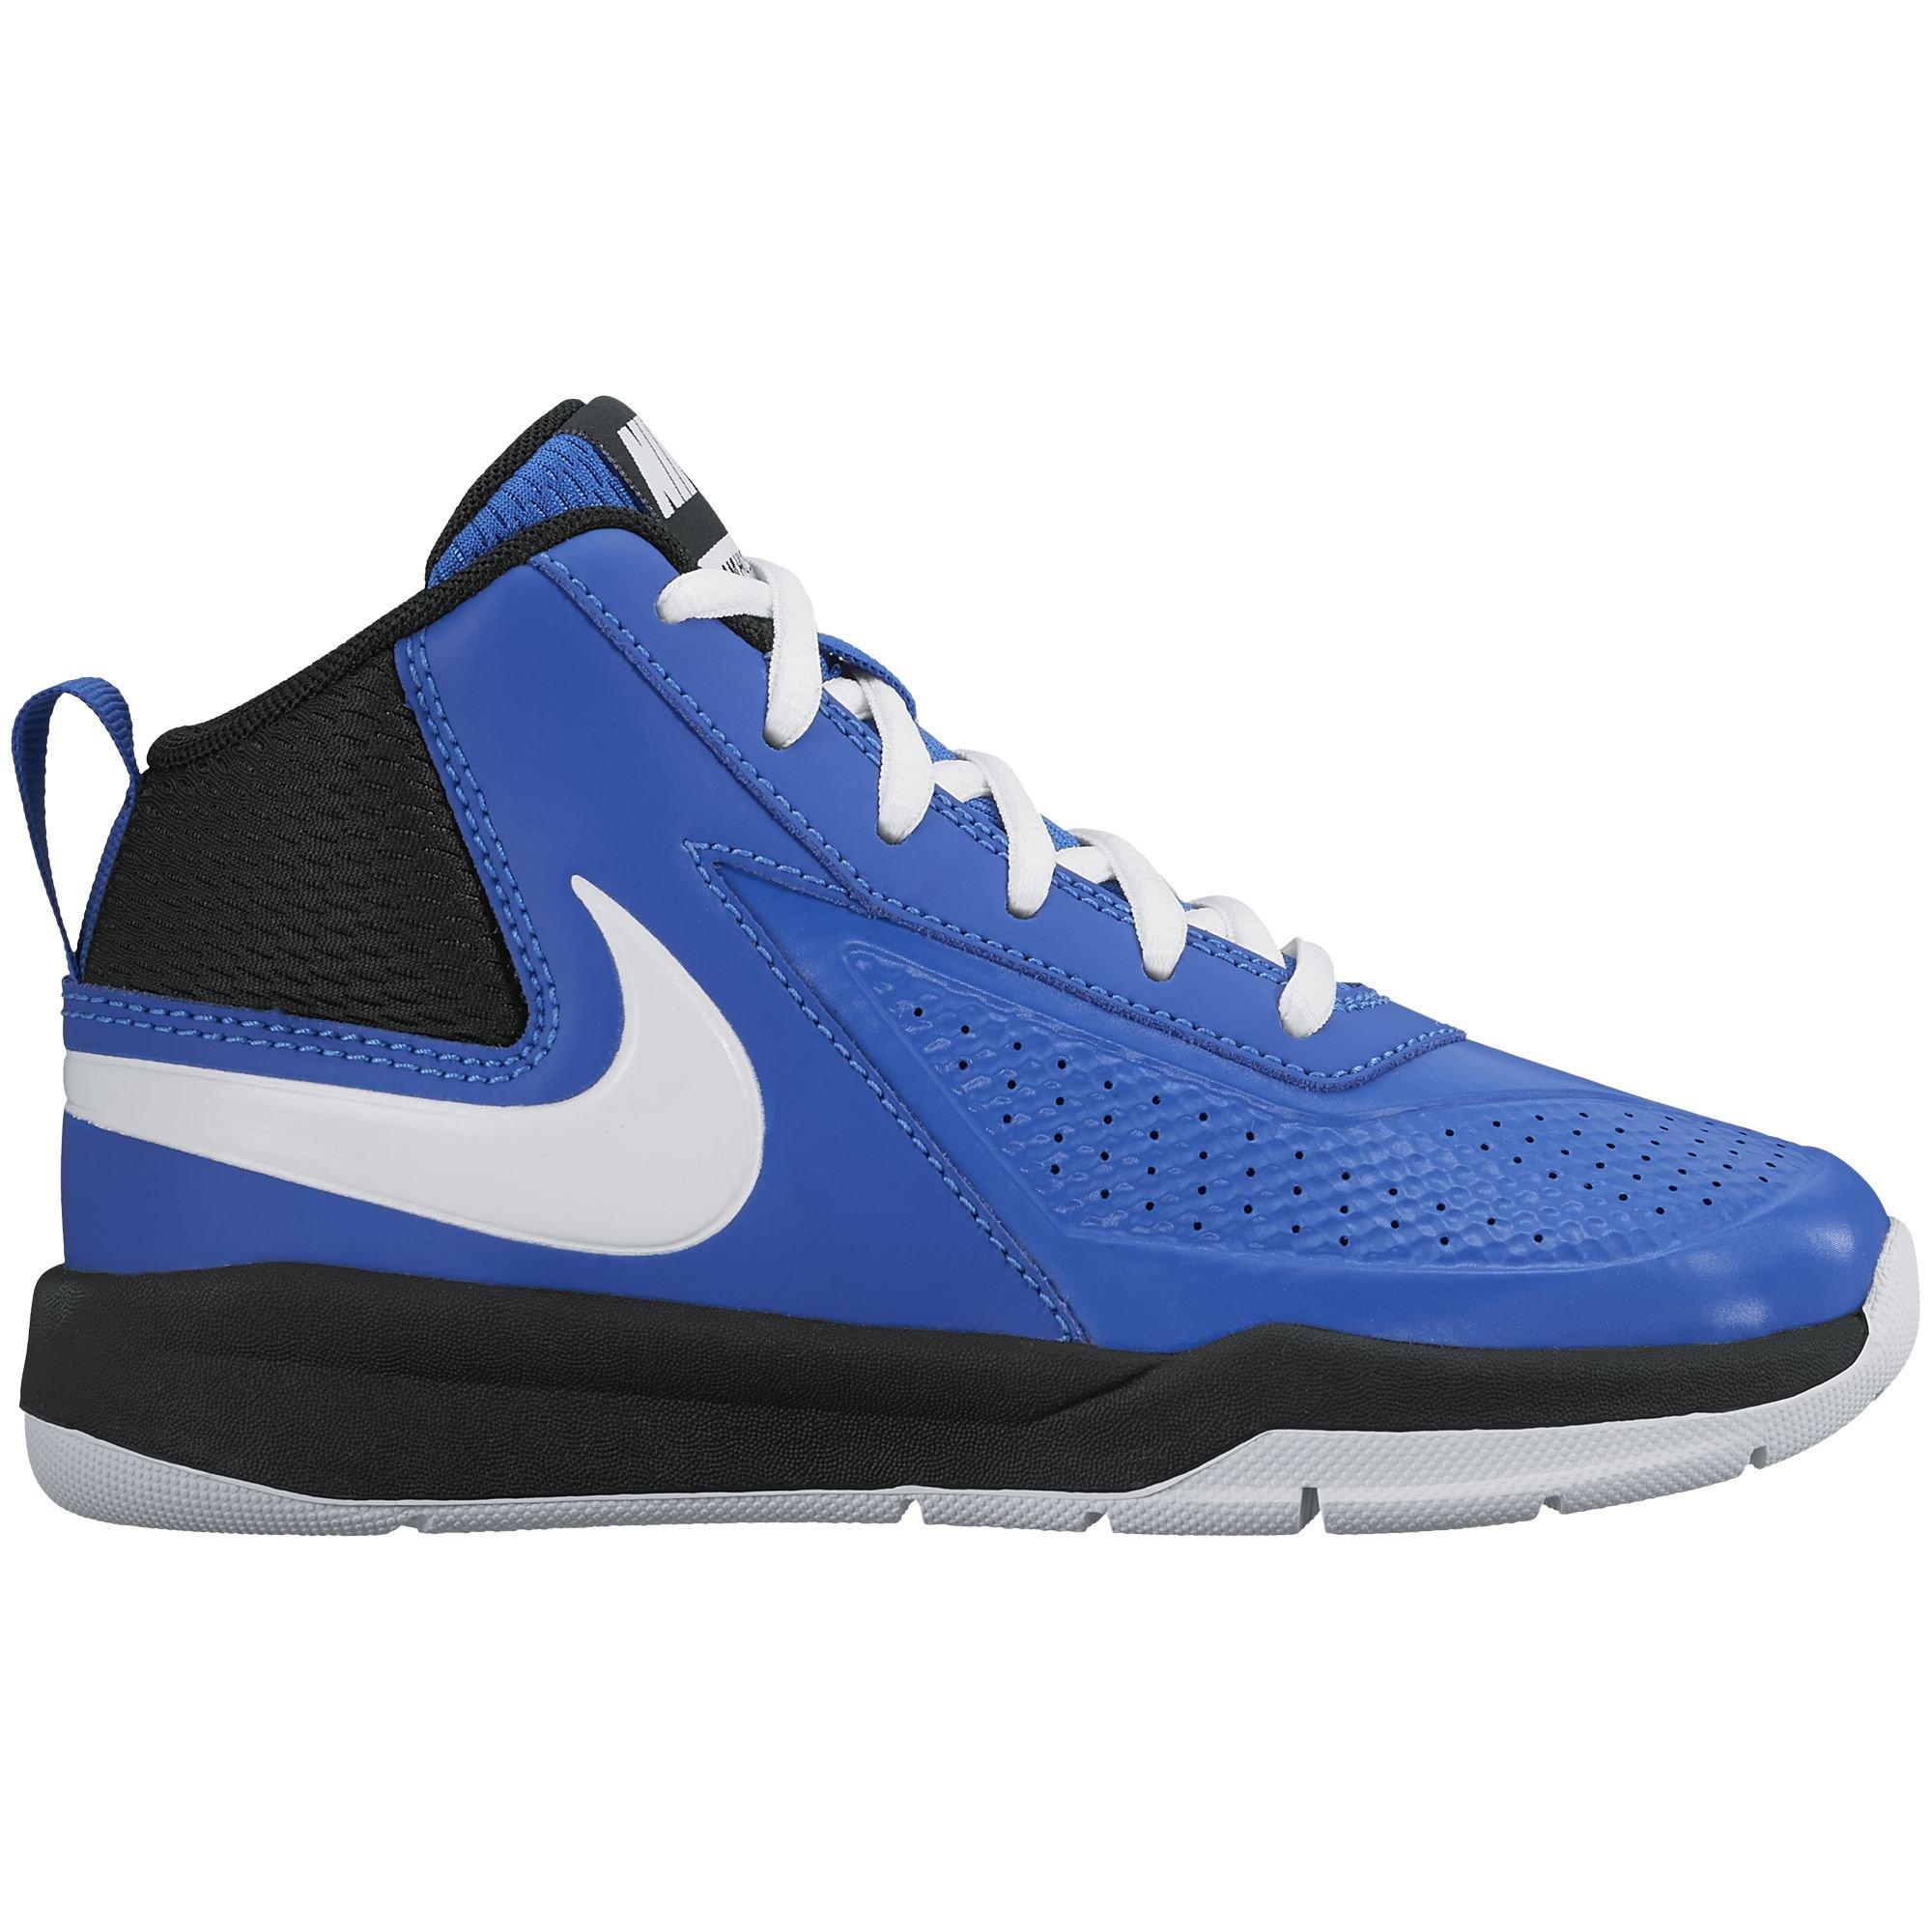 Nike Boy's Team Hustle D 7 Basketball Shoe Game Royal/White/Black Size 12.5 Kids US